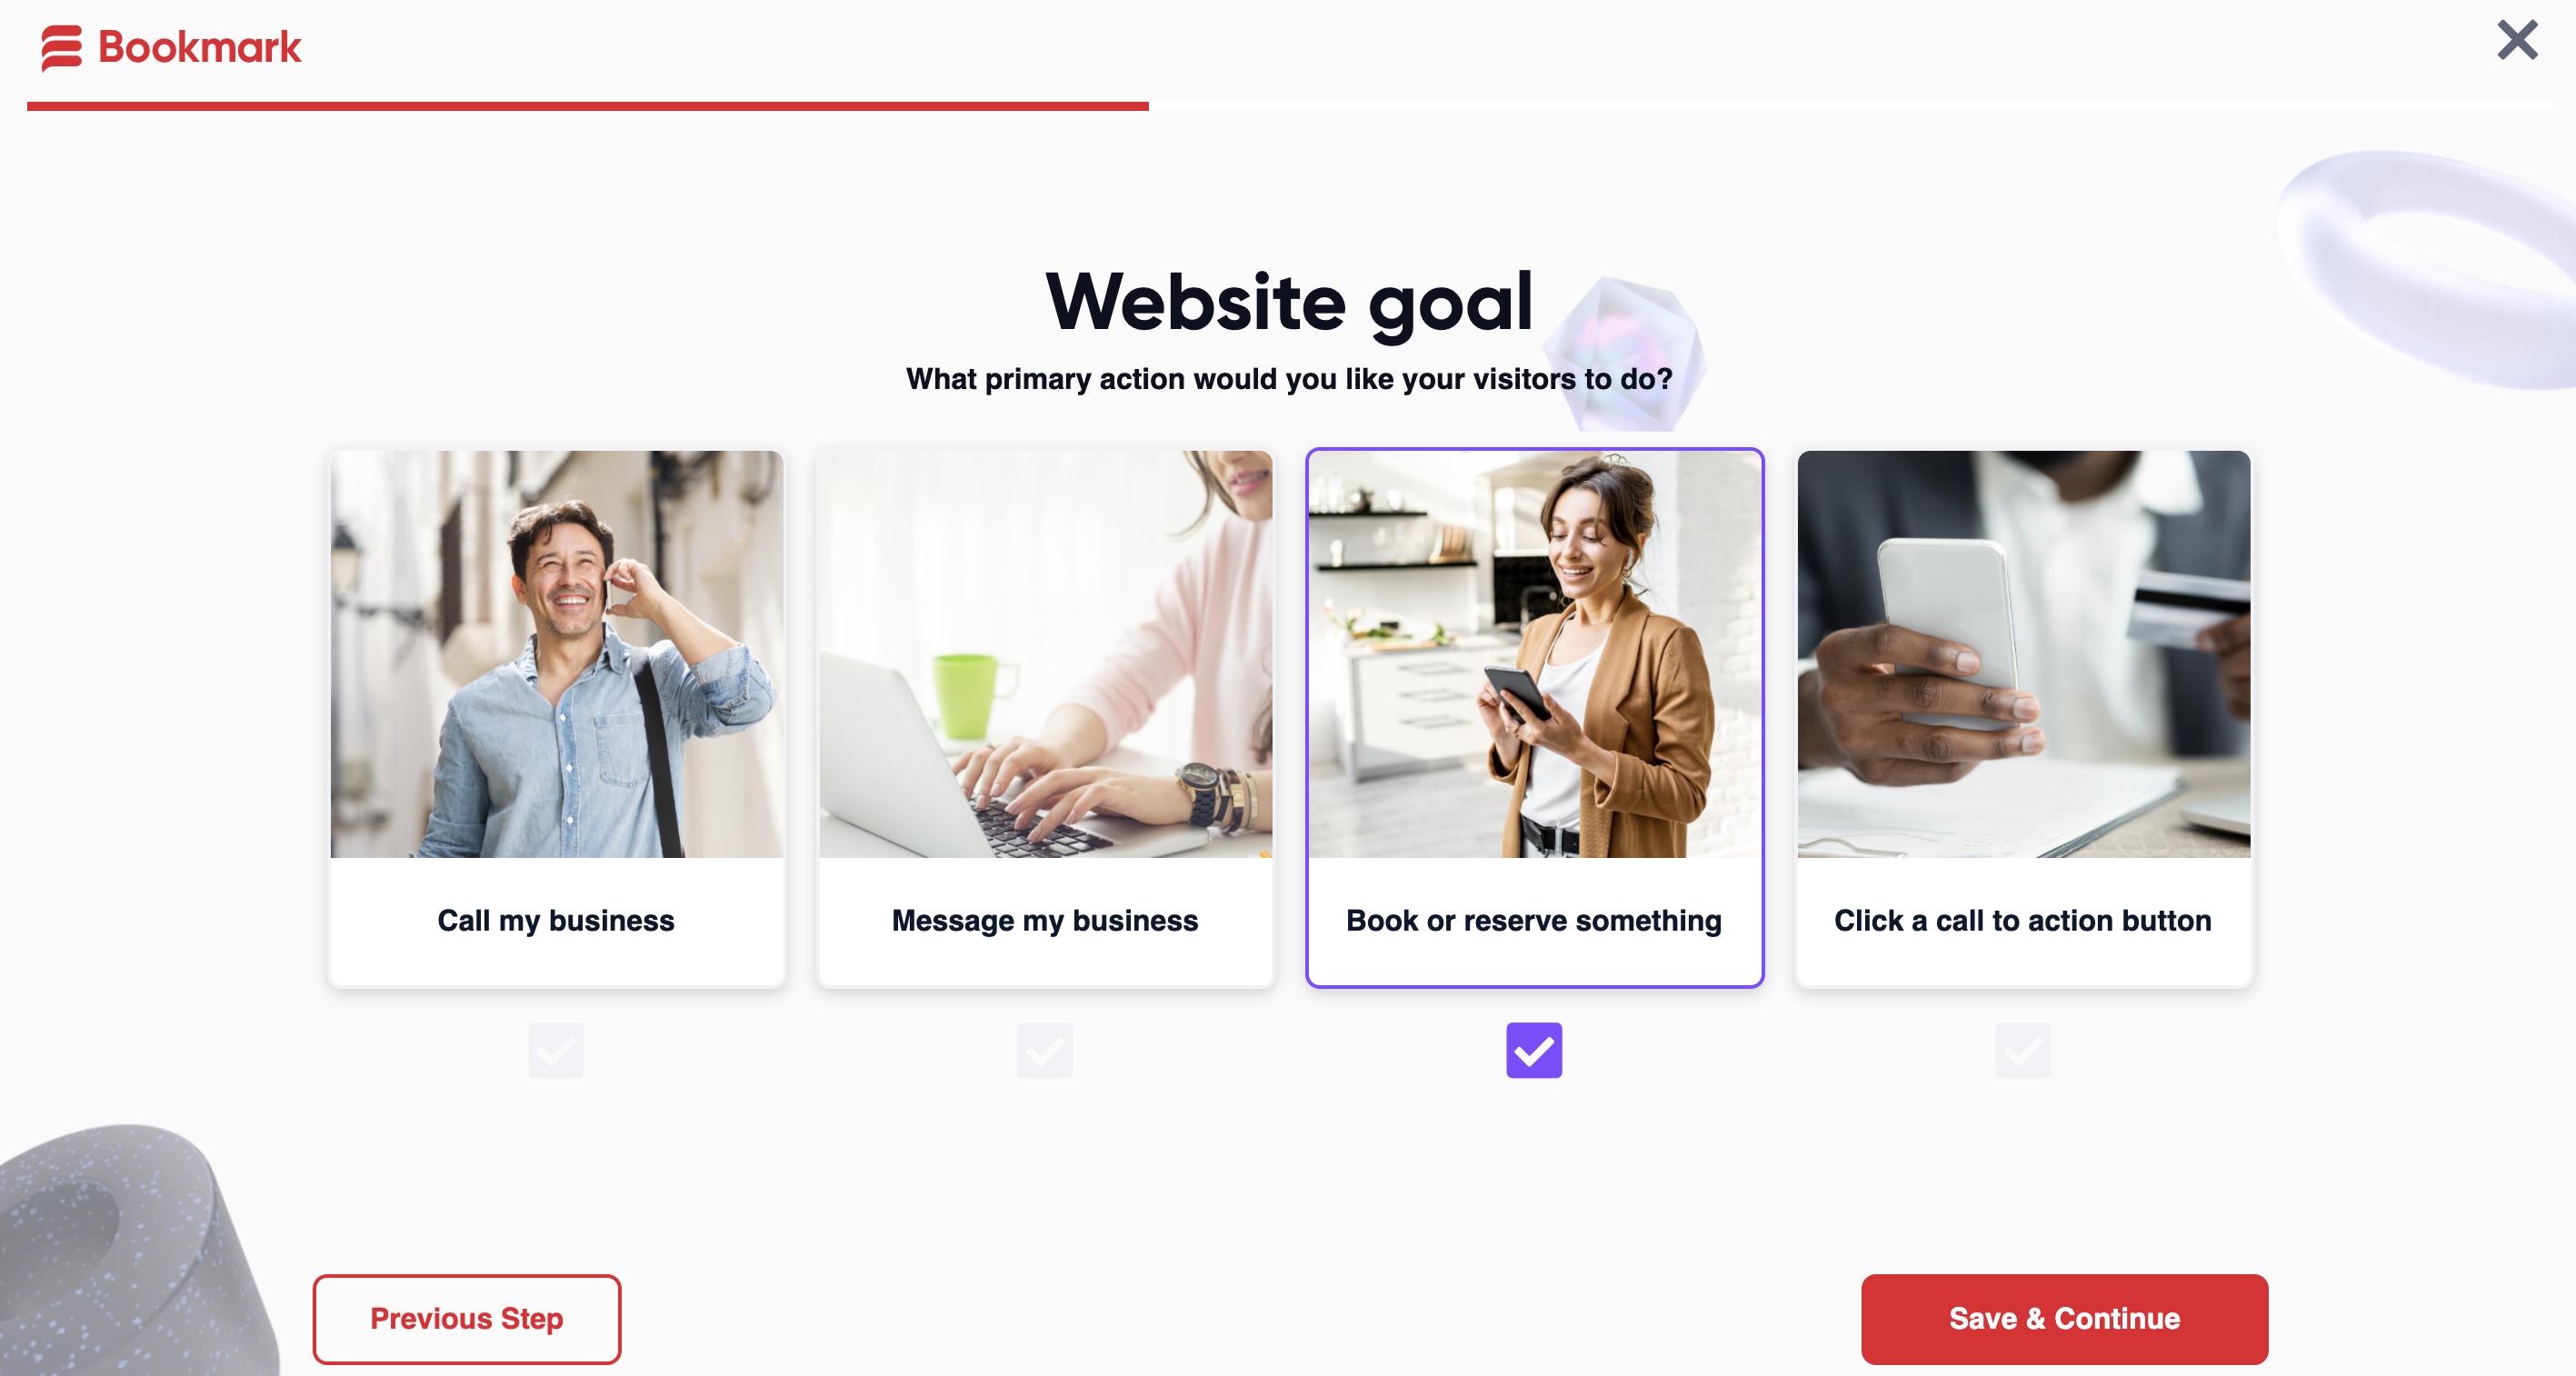 Choose your website goal